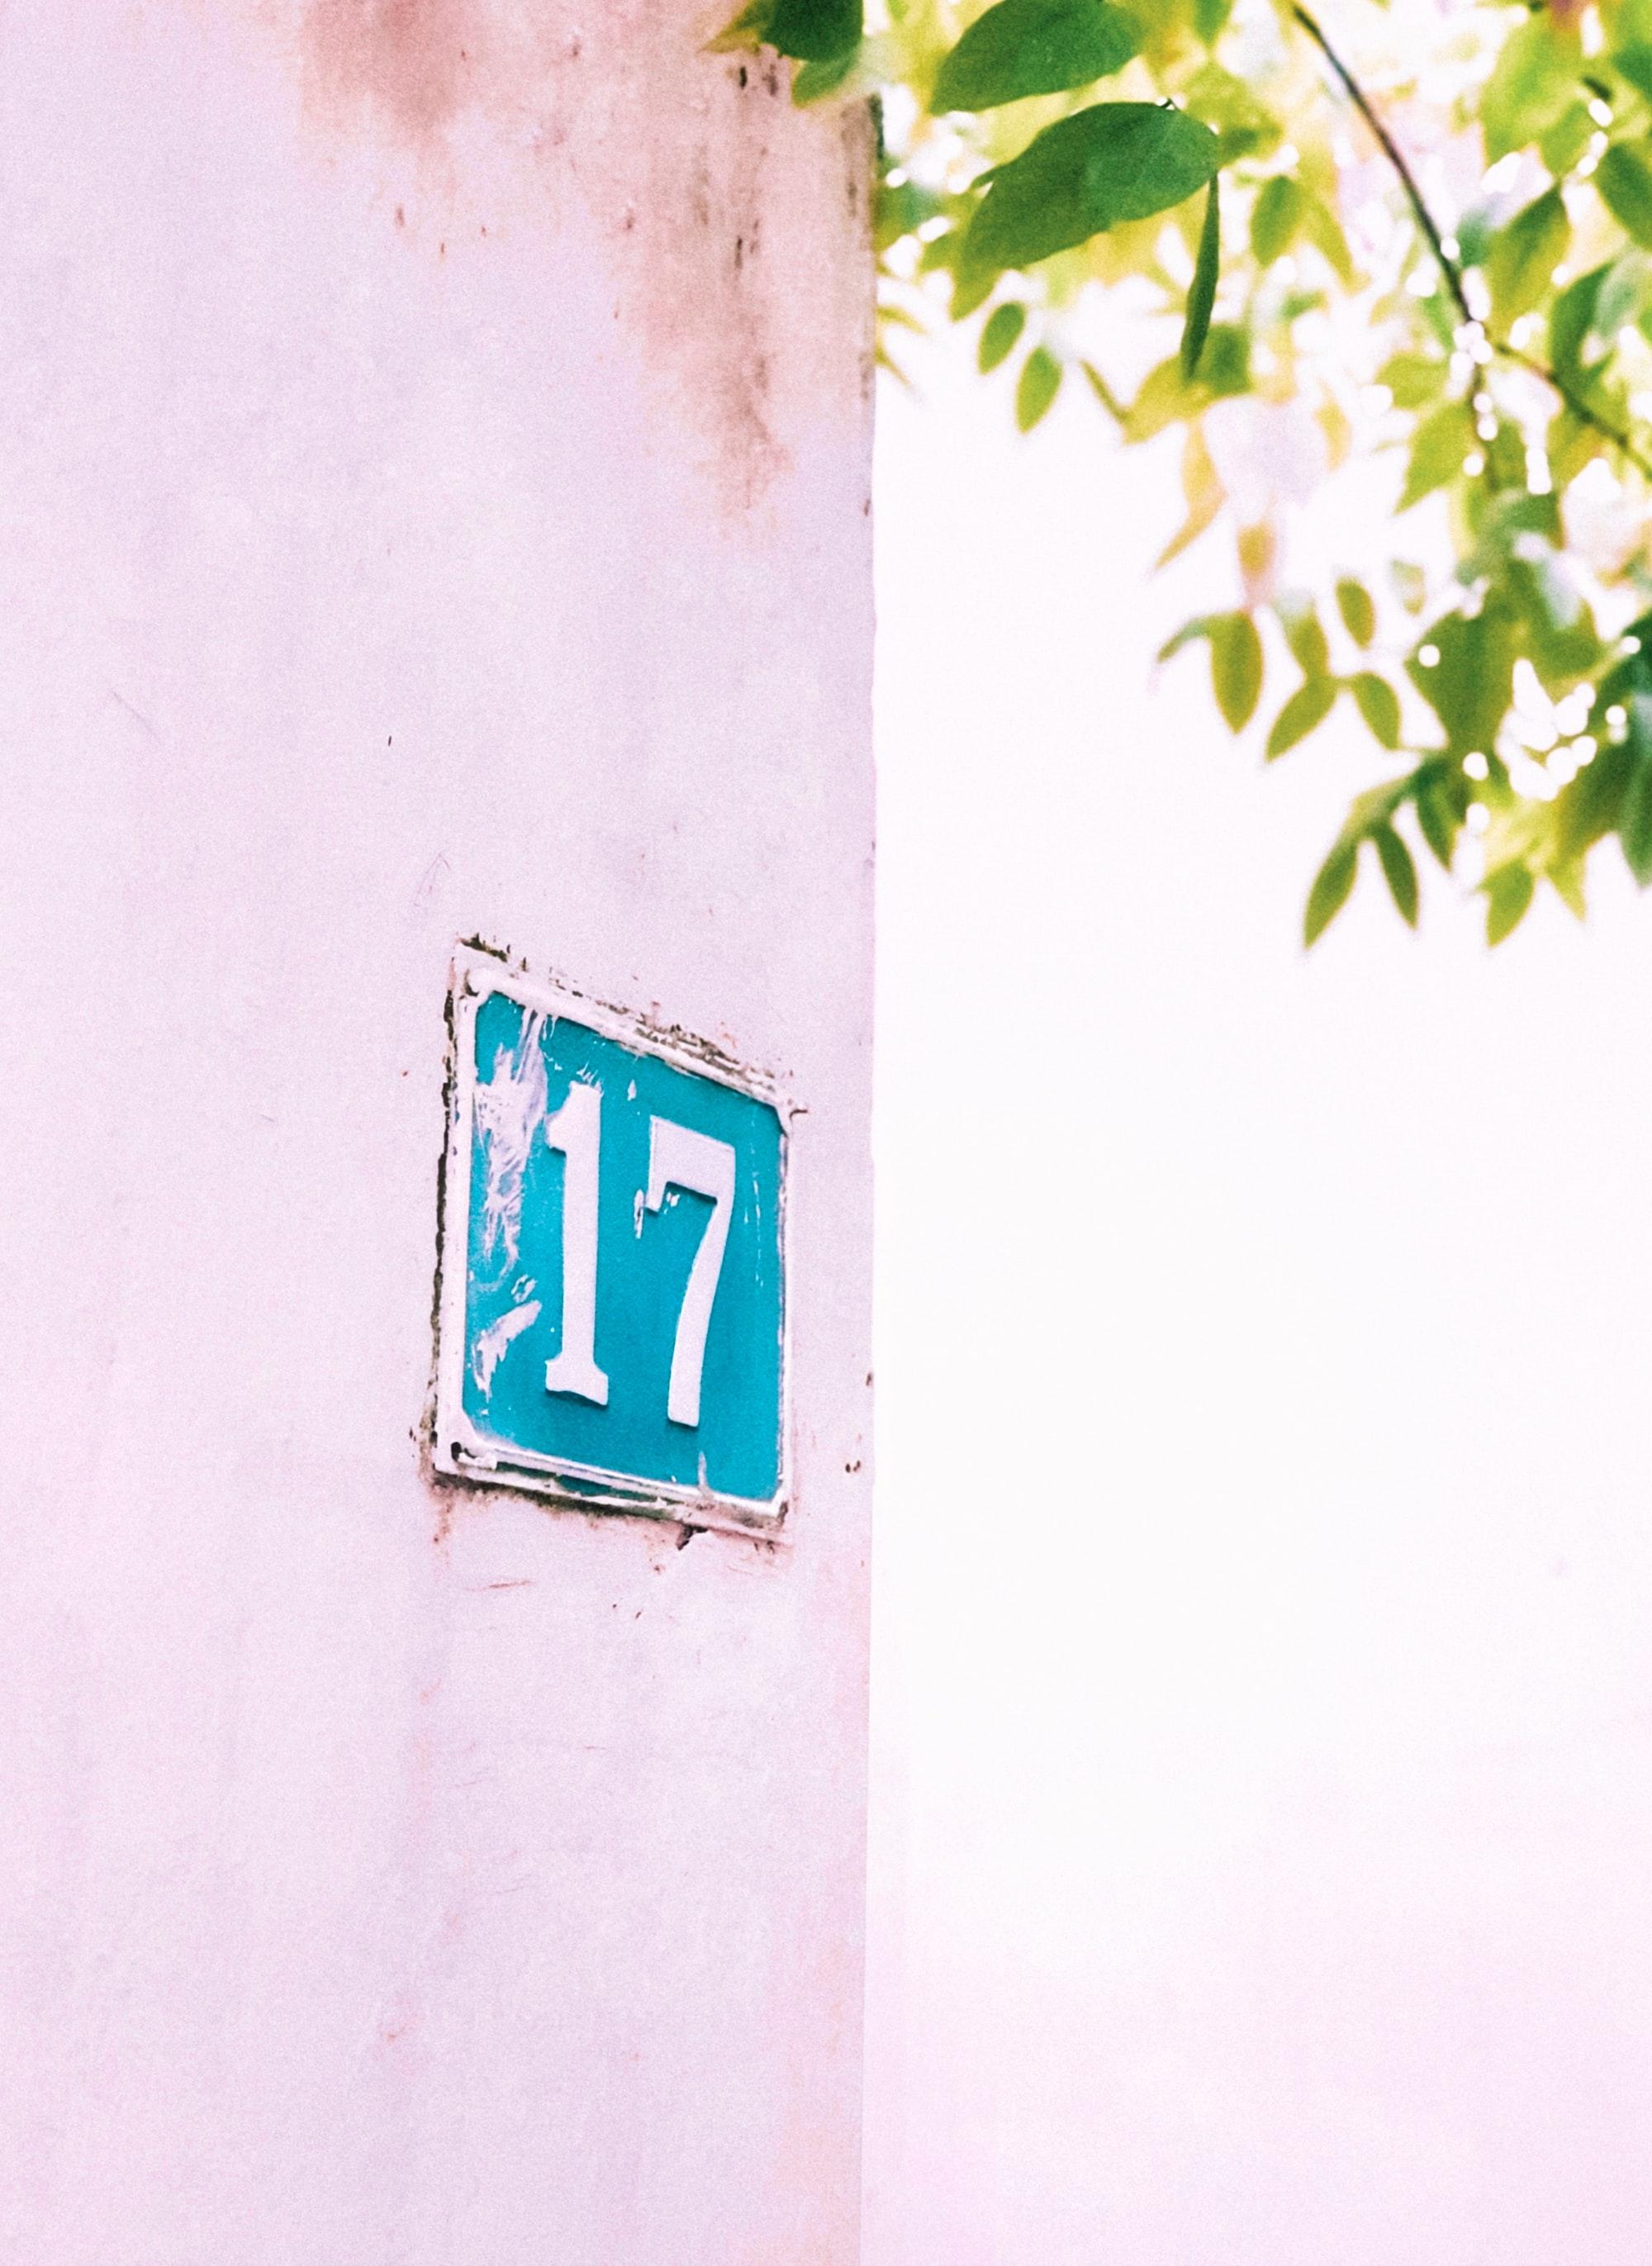 Born on the 17th.